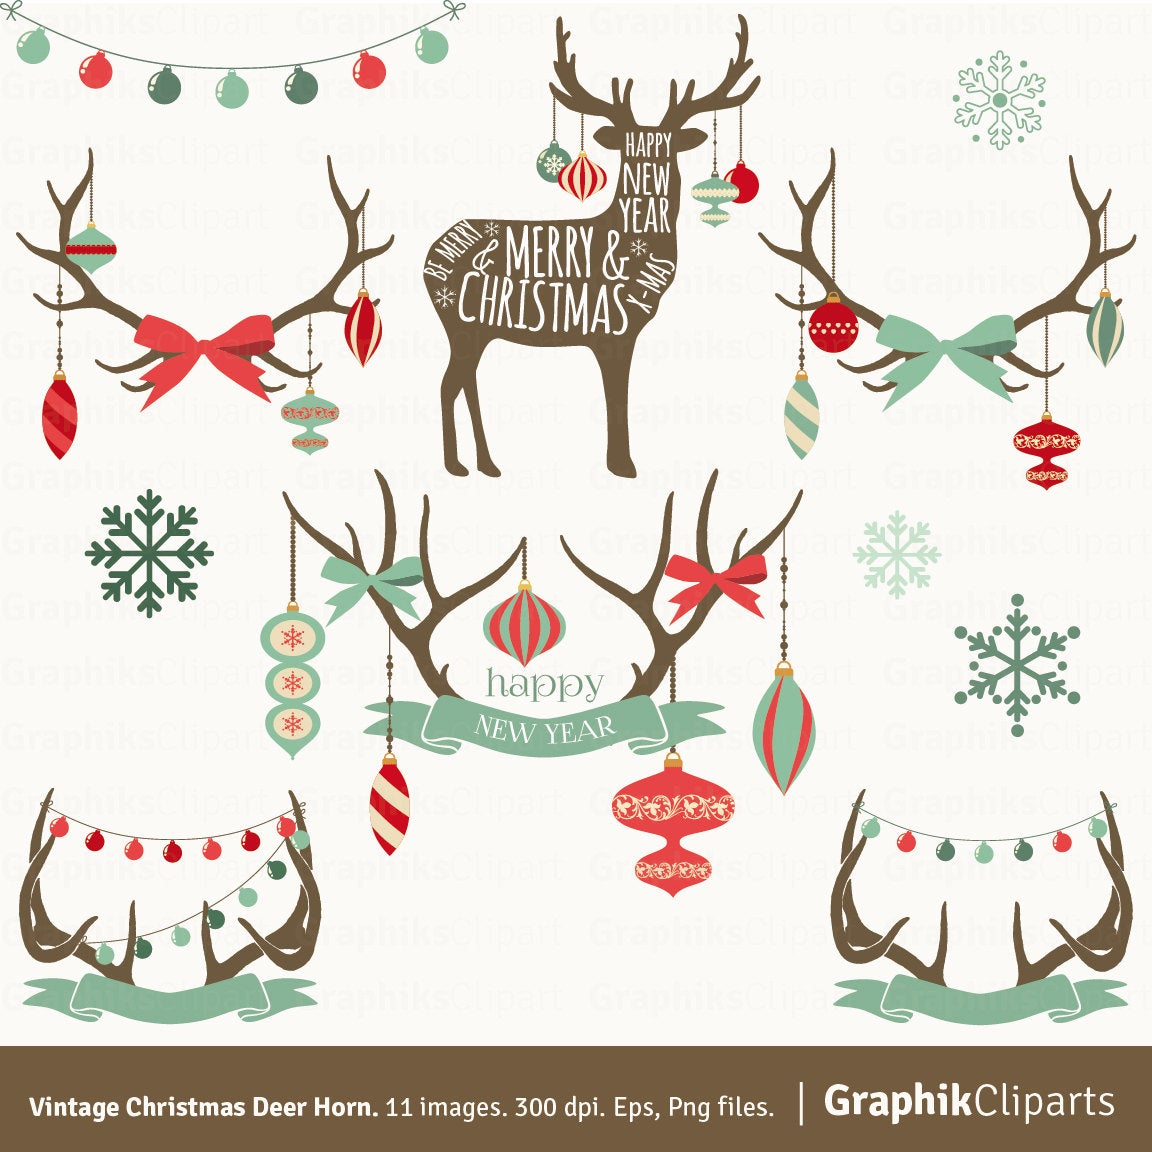 Christmas deer clipart. Christmas vectors, Ornaments clipart, Christmas  clip art. 11 Eps, Png files..